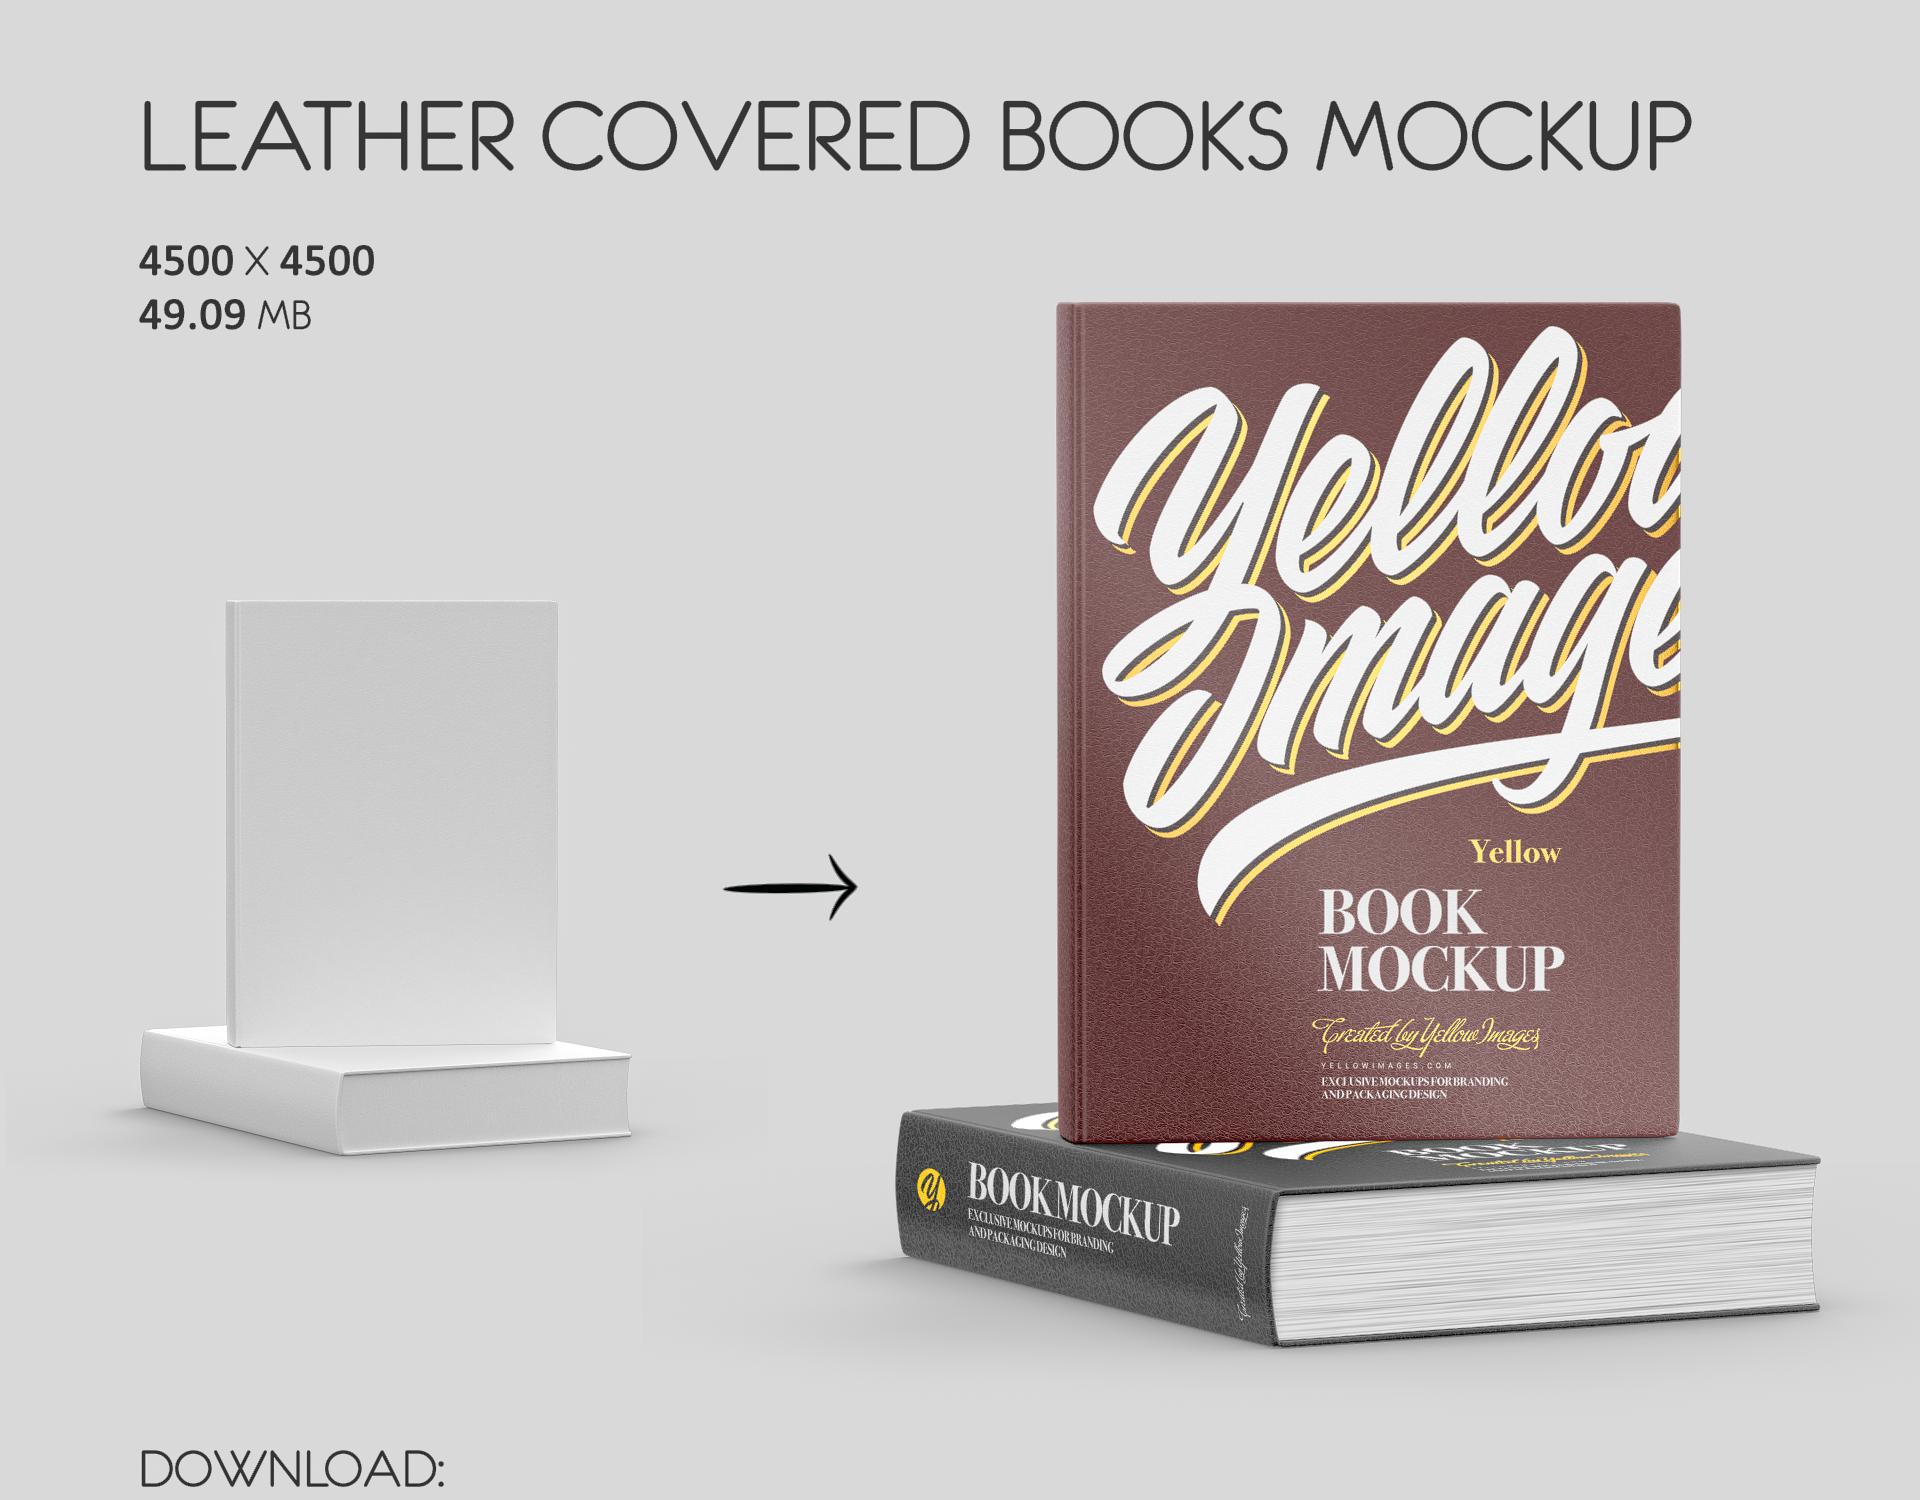 Download Book Mockups On Behance PSD Mockup Templates